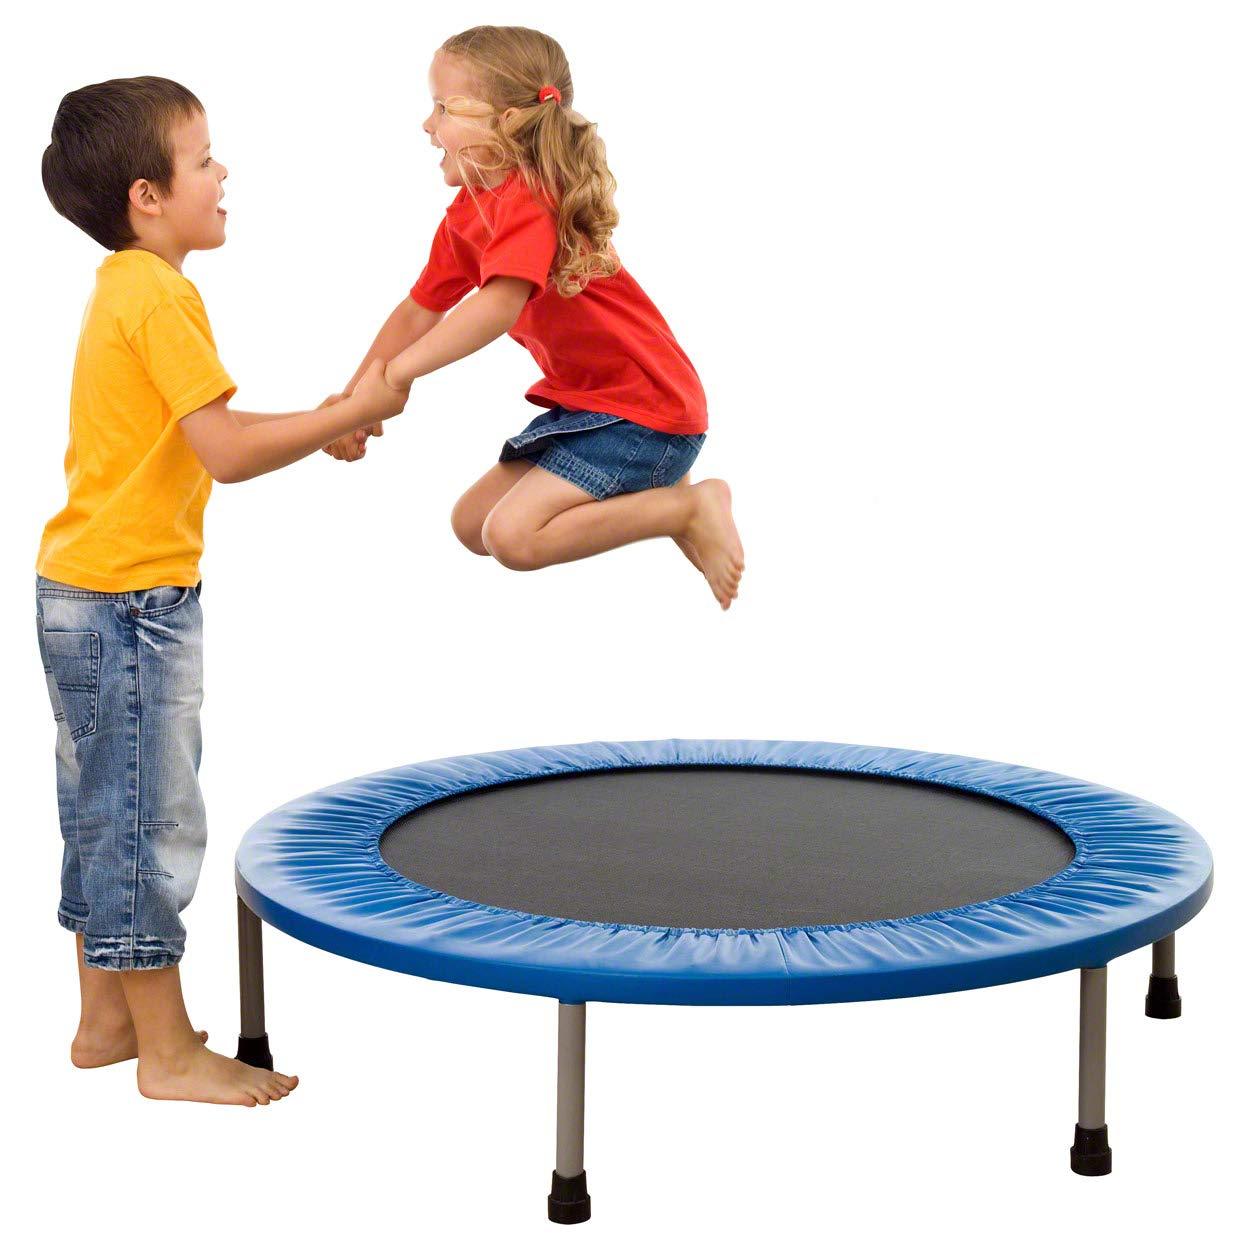 Sport-Tec Trampolin, Fitness Trampolin, Indoor Trampolin, Kinder Trampolin, Mini ø 125 cm